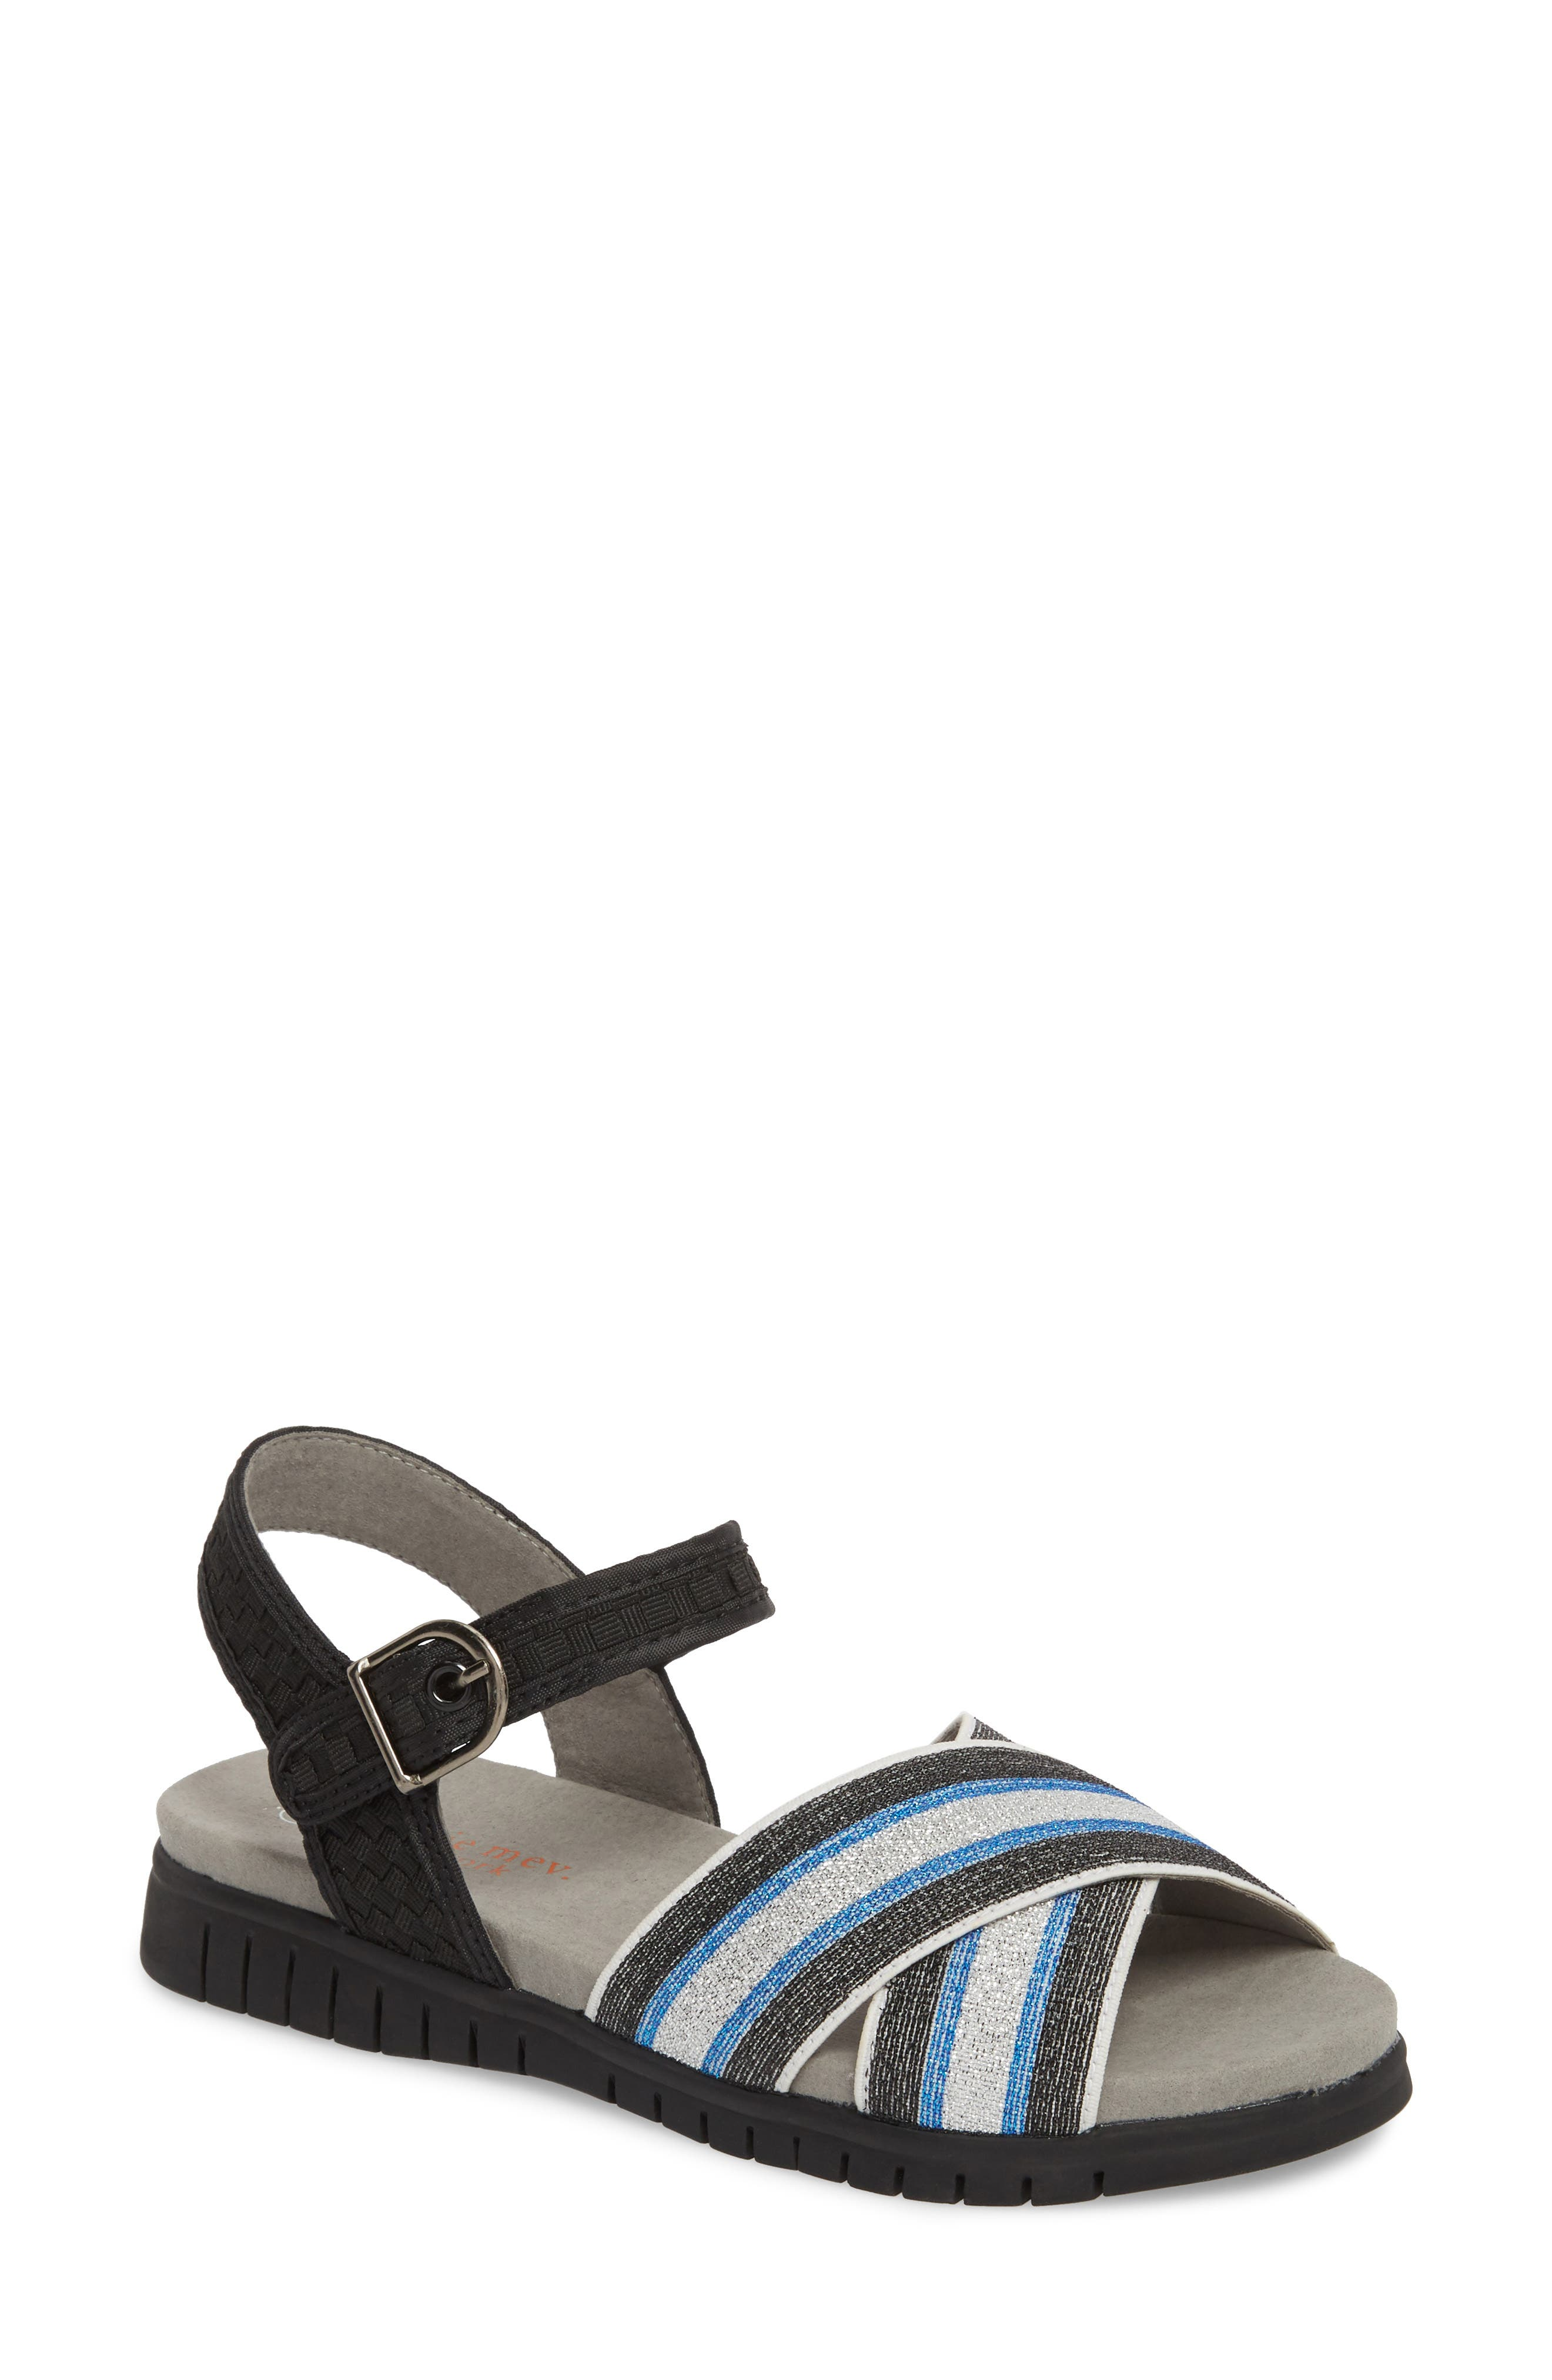 Malibu Sandal, Main, color, BLACK BLUE STRIPE FABRIC